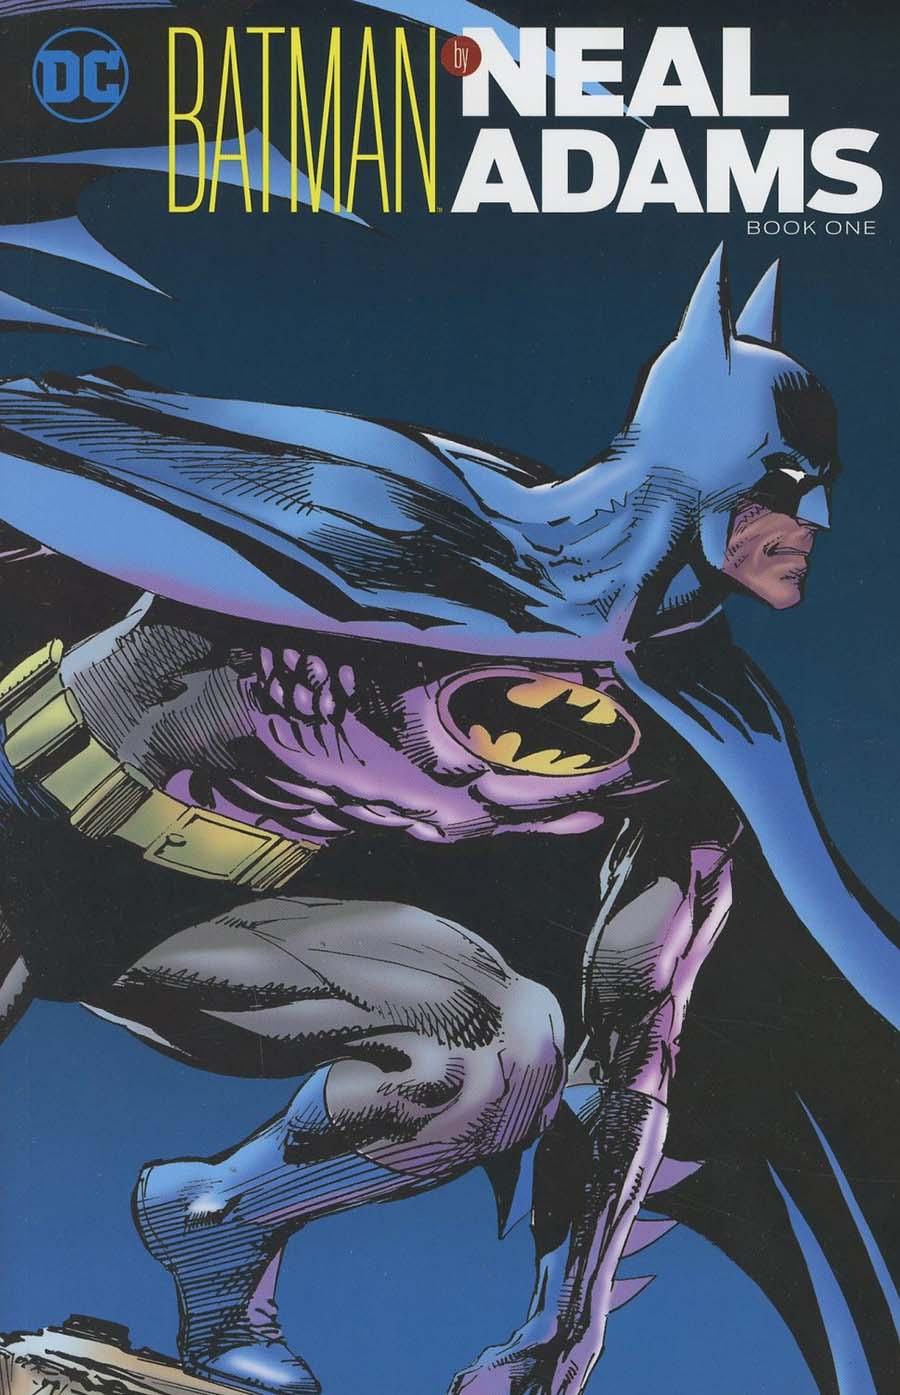 Batman By Neal Adams Book 1 TP